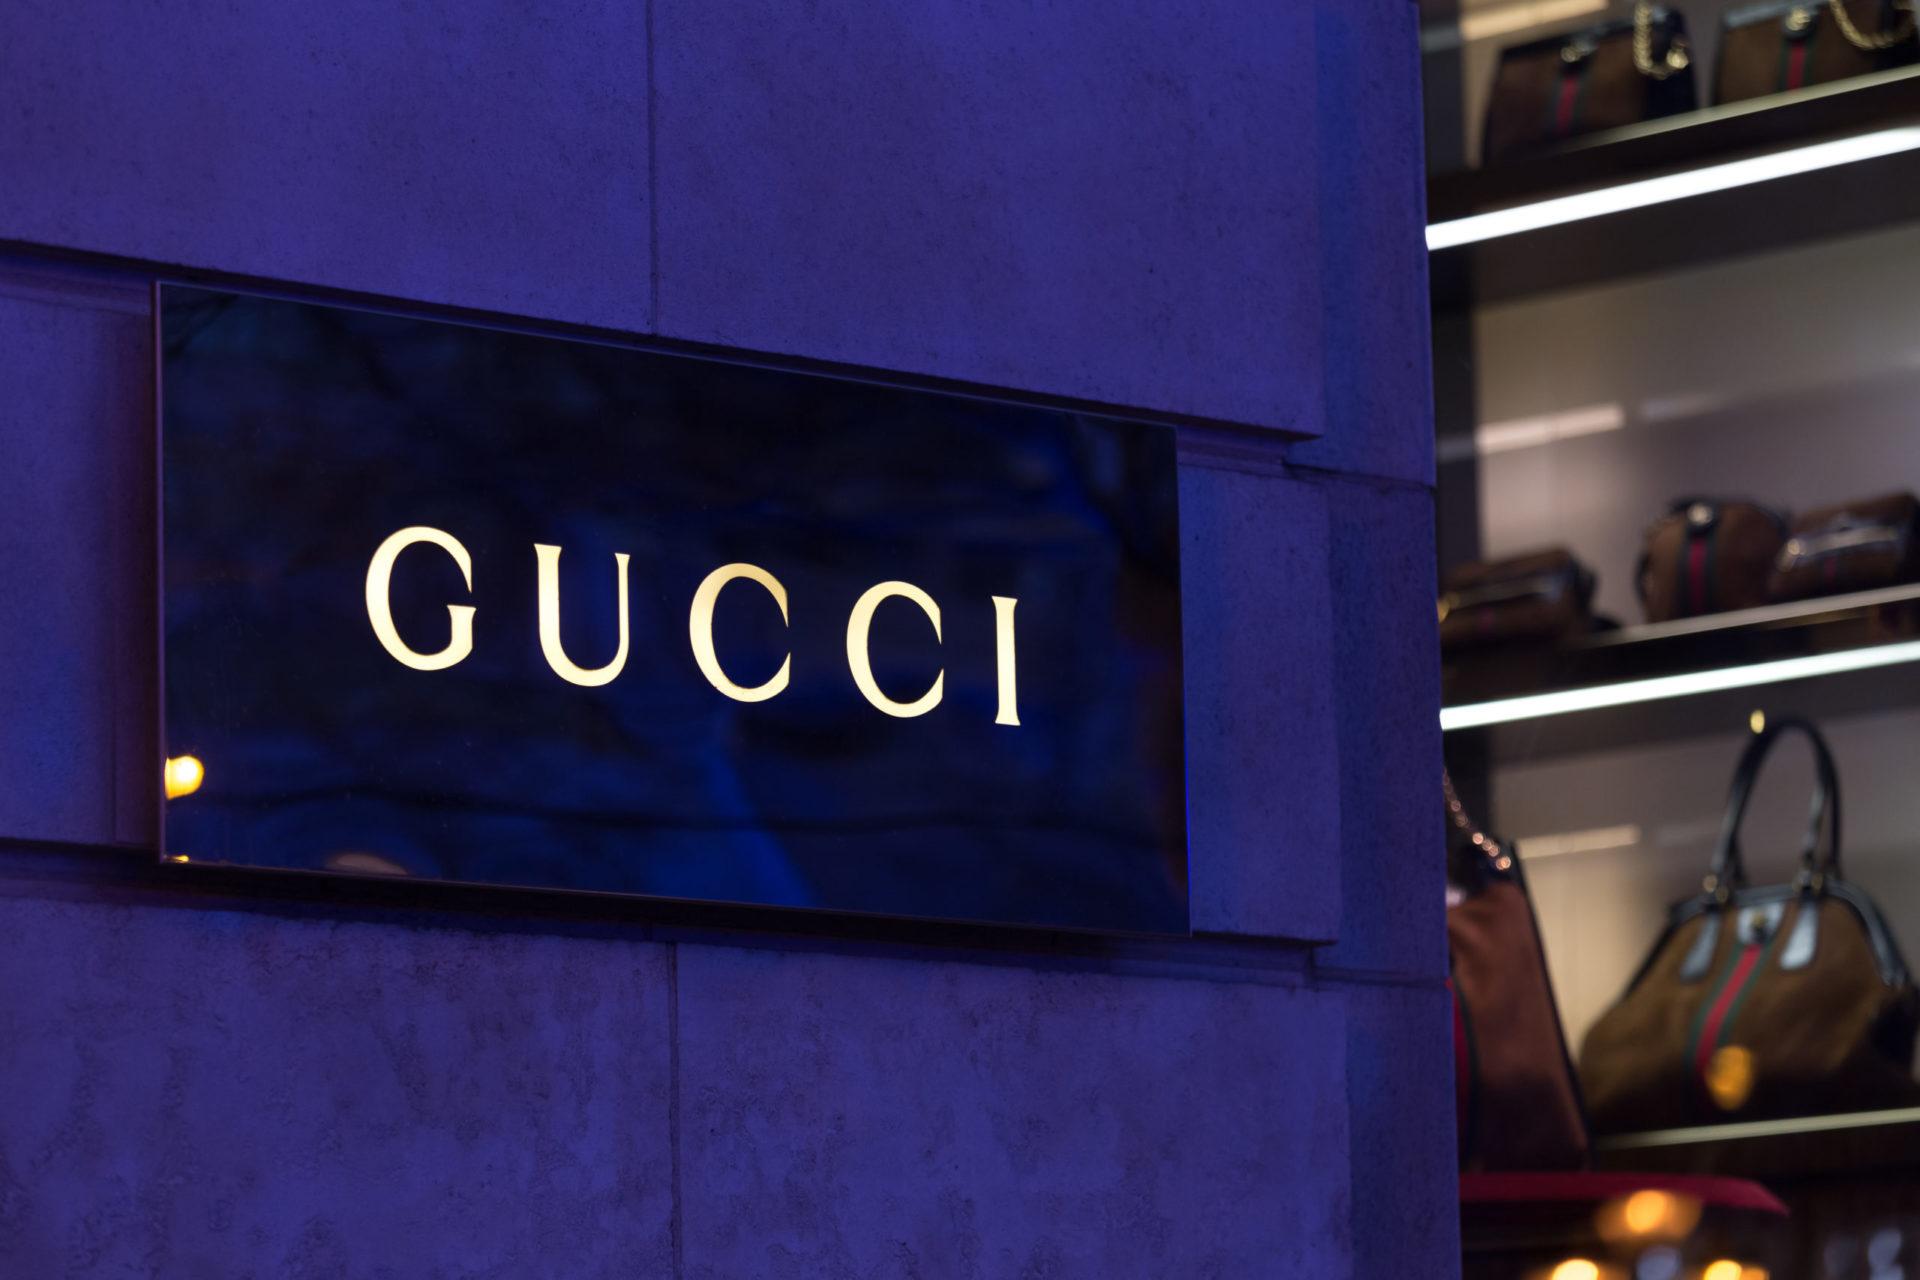 brussels, brussels/belgium - 13 12 18: gucci store sign in brussels belgium